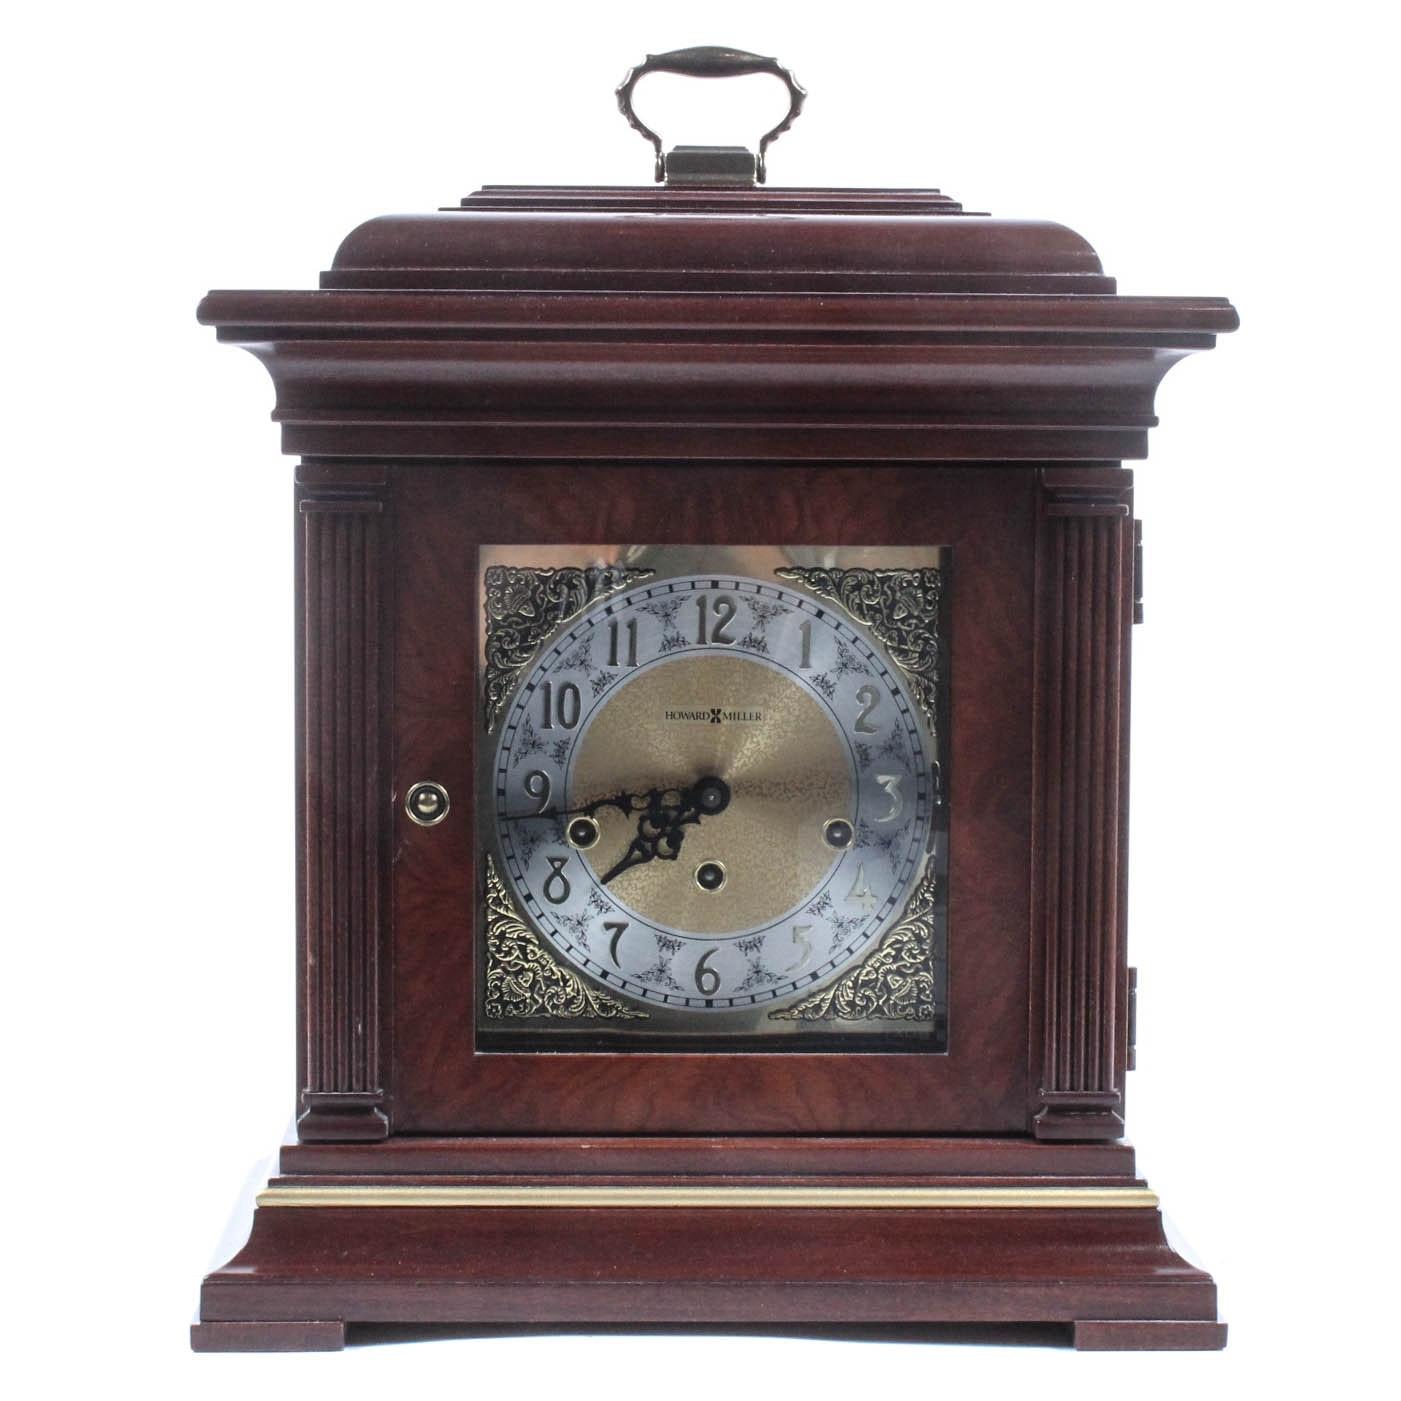 Howard Miller Chiming Key Wound Mantel Clock